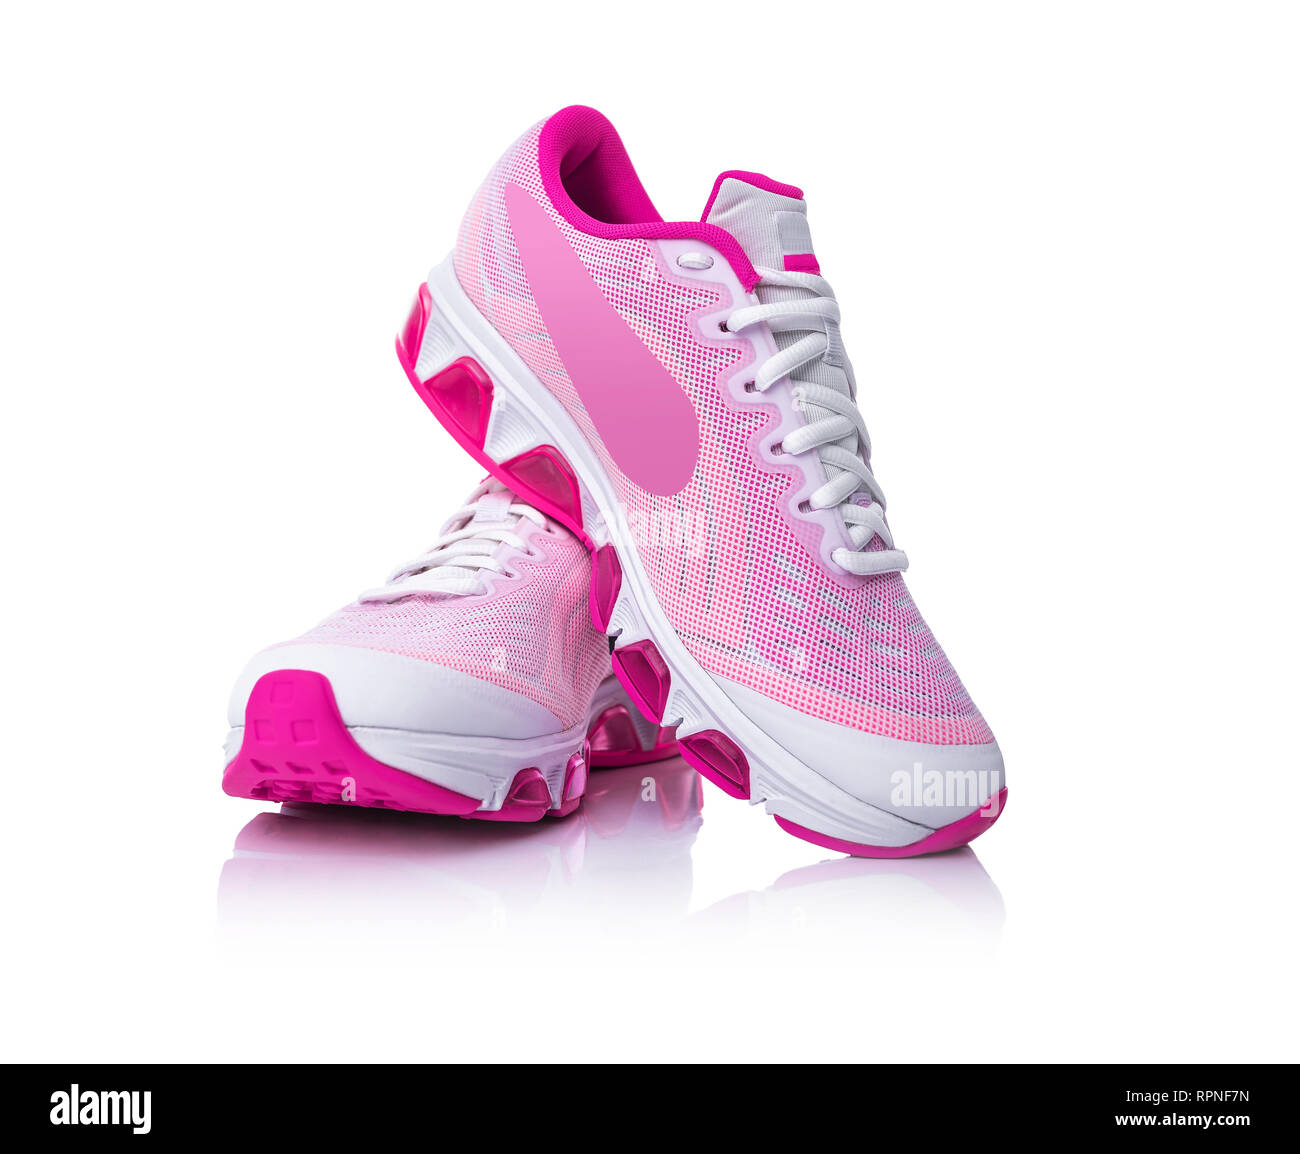 cheaper c8b33 fc3b0 Chaussures de sport rose sur fond blanc. Photo Stock